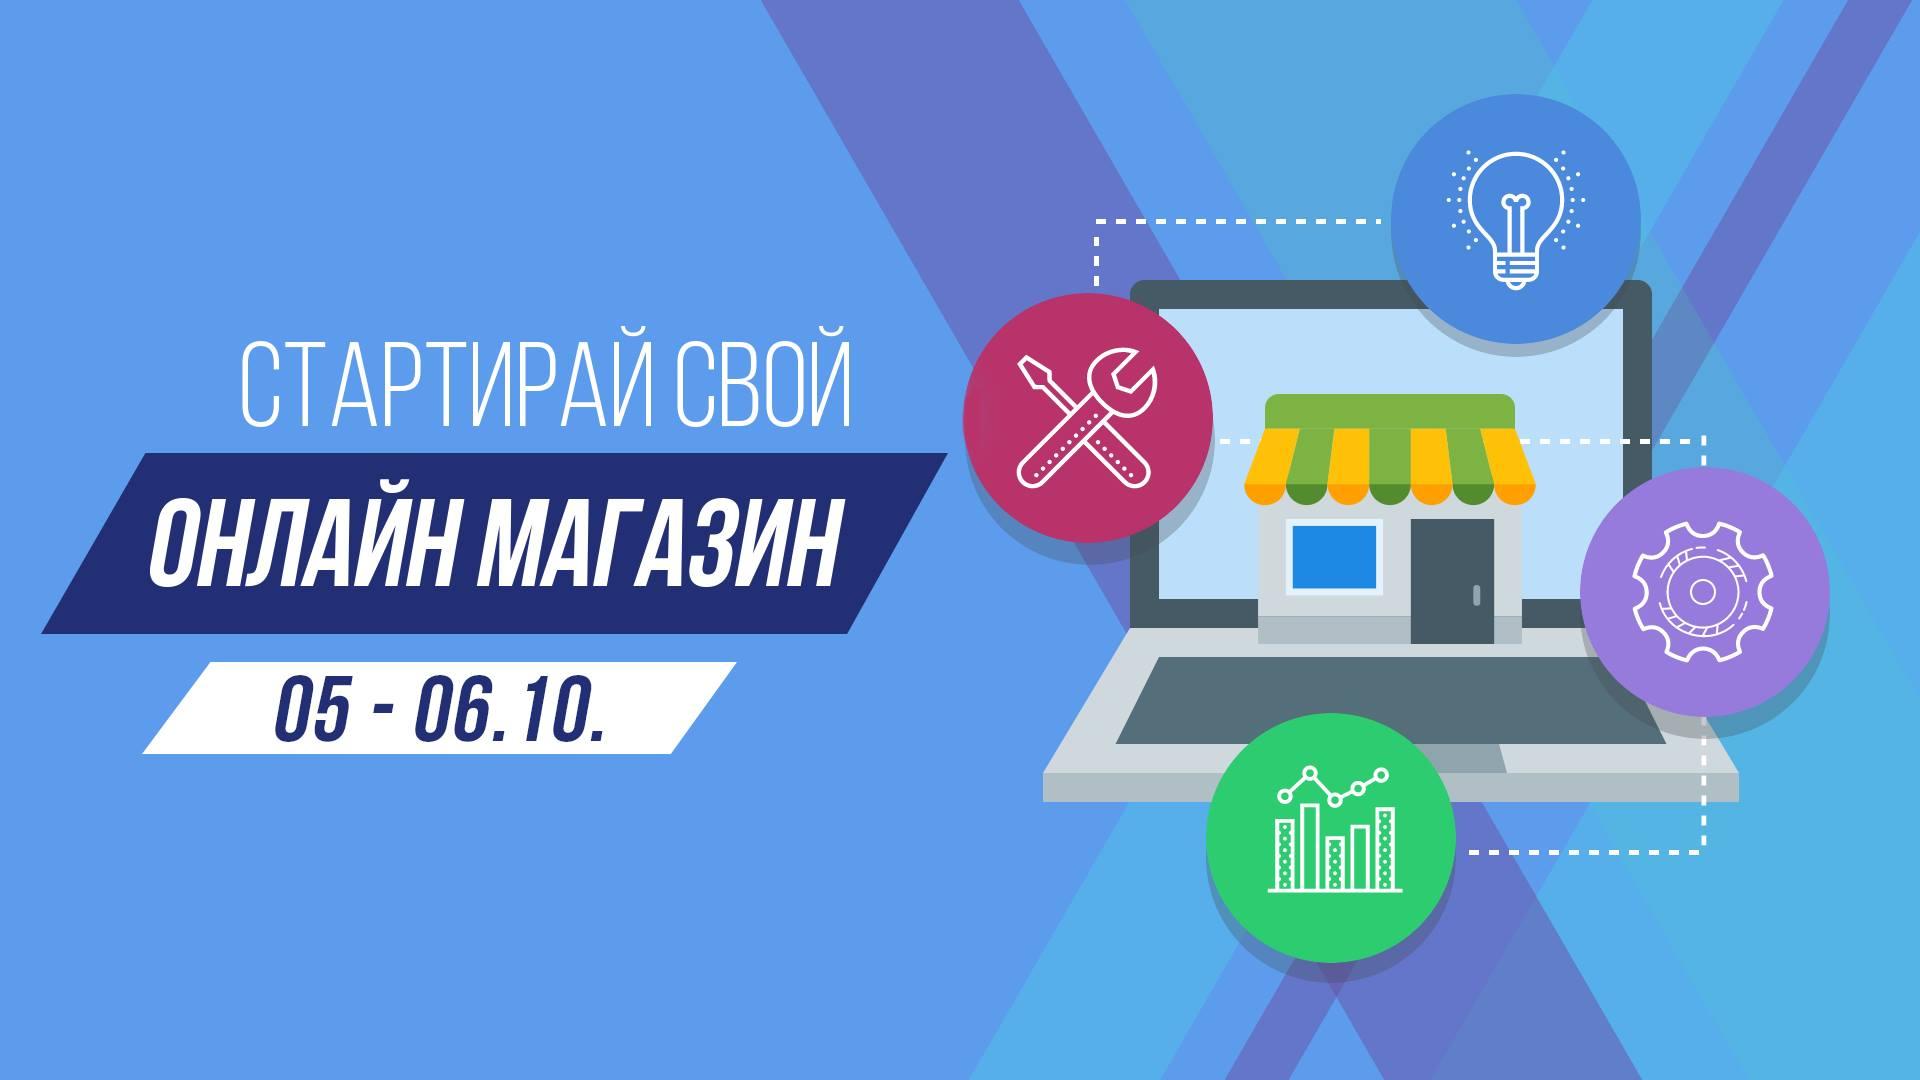 Безплатно обучение-стартирай свой собствн онлайн магазин